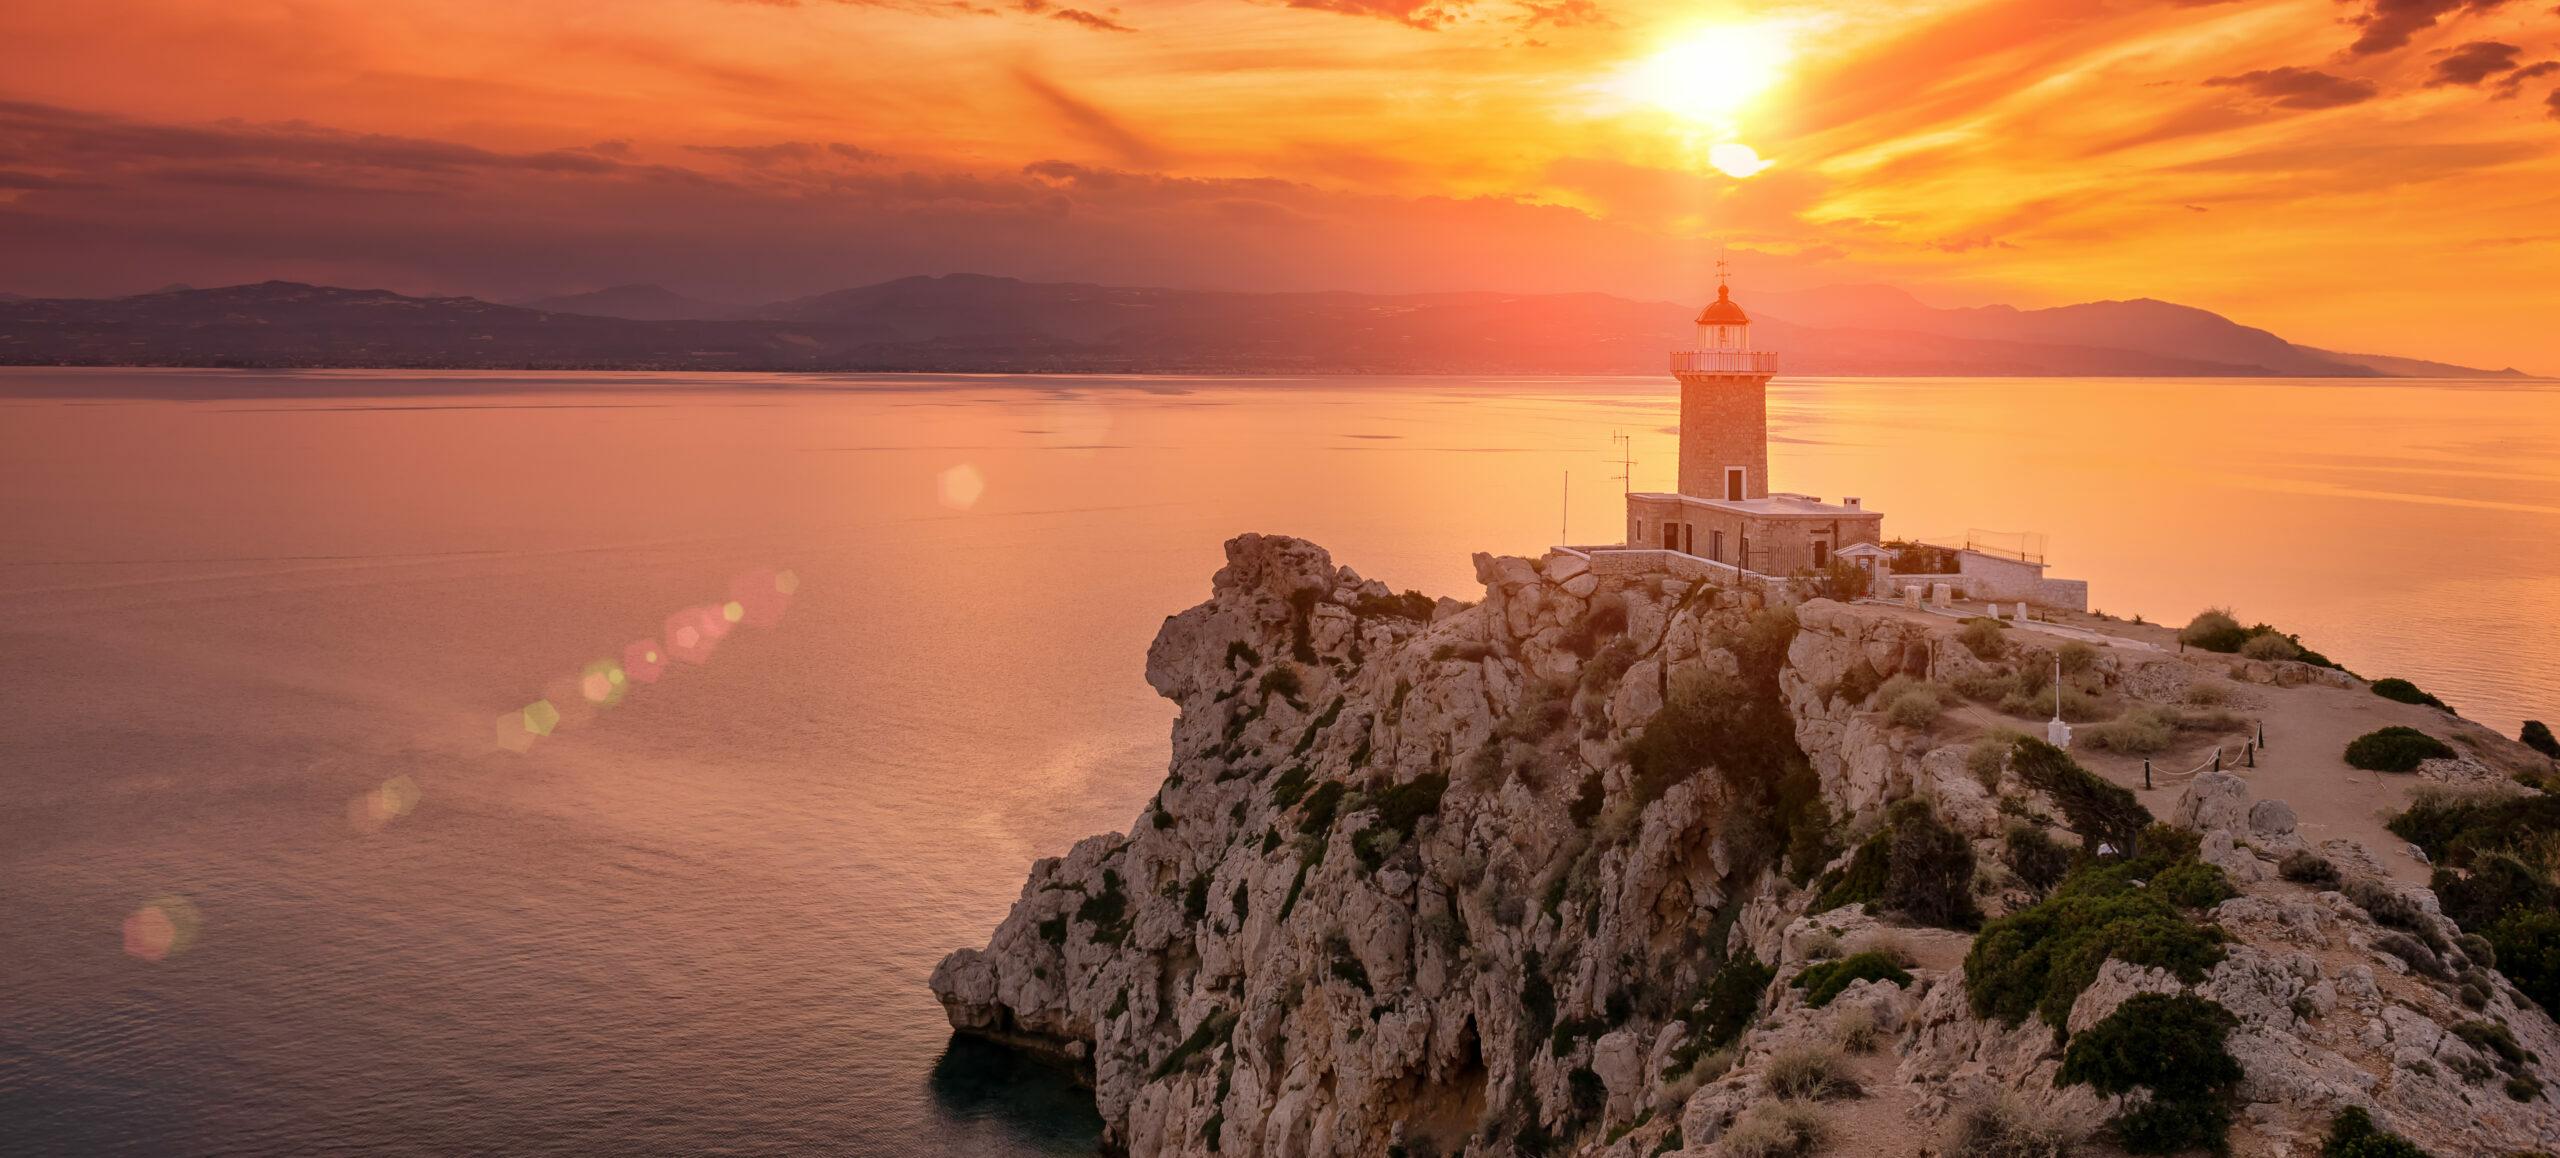 Attica: the Melagavi lighthouse area